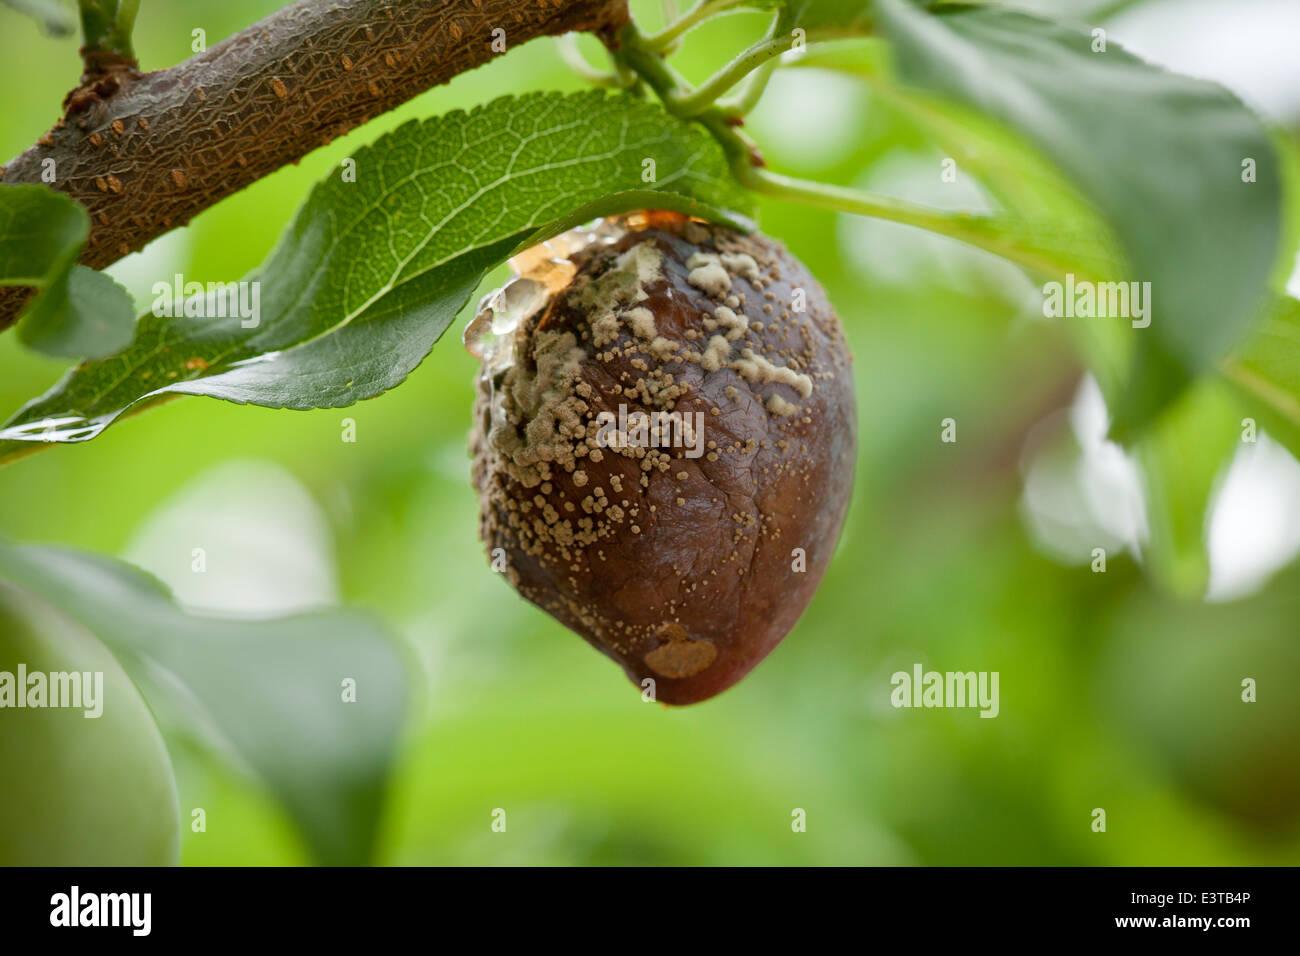 Brown rot fungal disease (Monilinia fructicola) on plum - USA - Stock Image